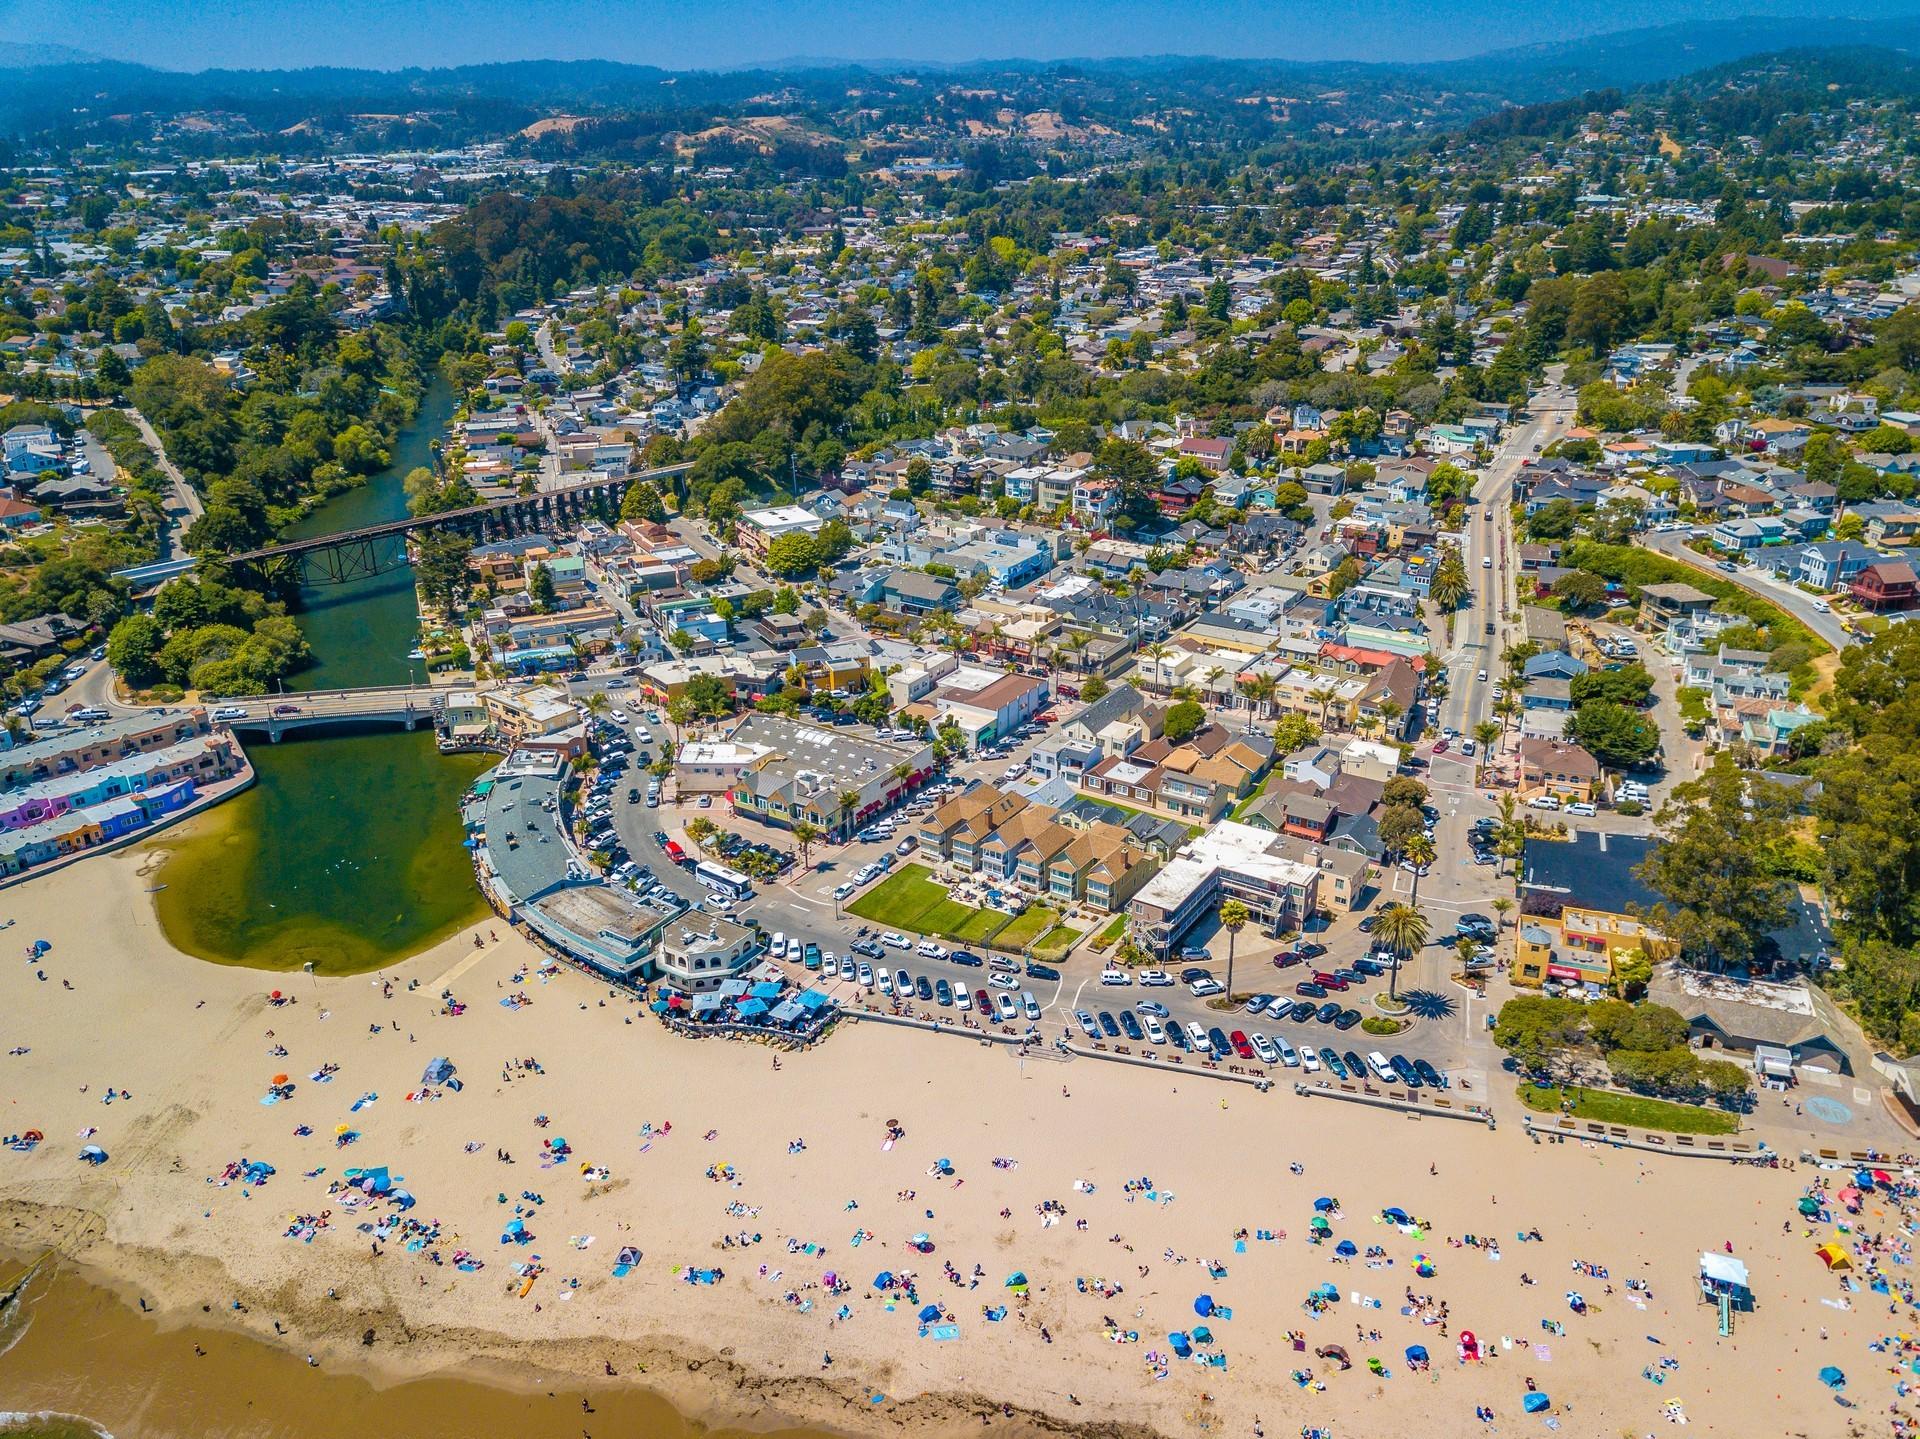 Santa Cruz Private Jet and Air Charter Flights